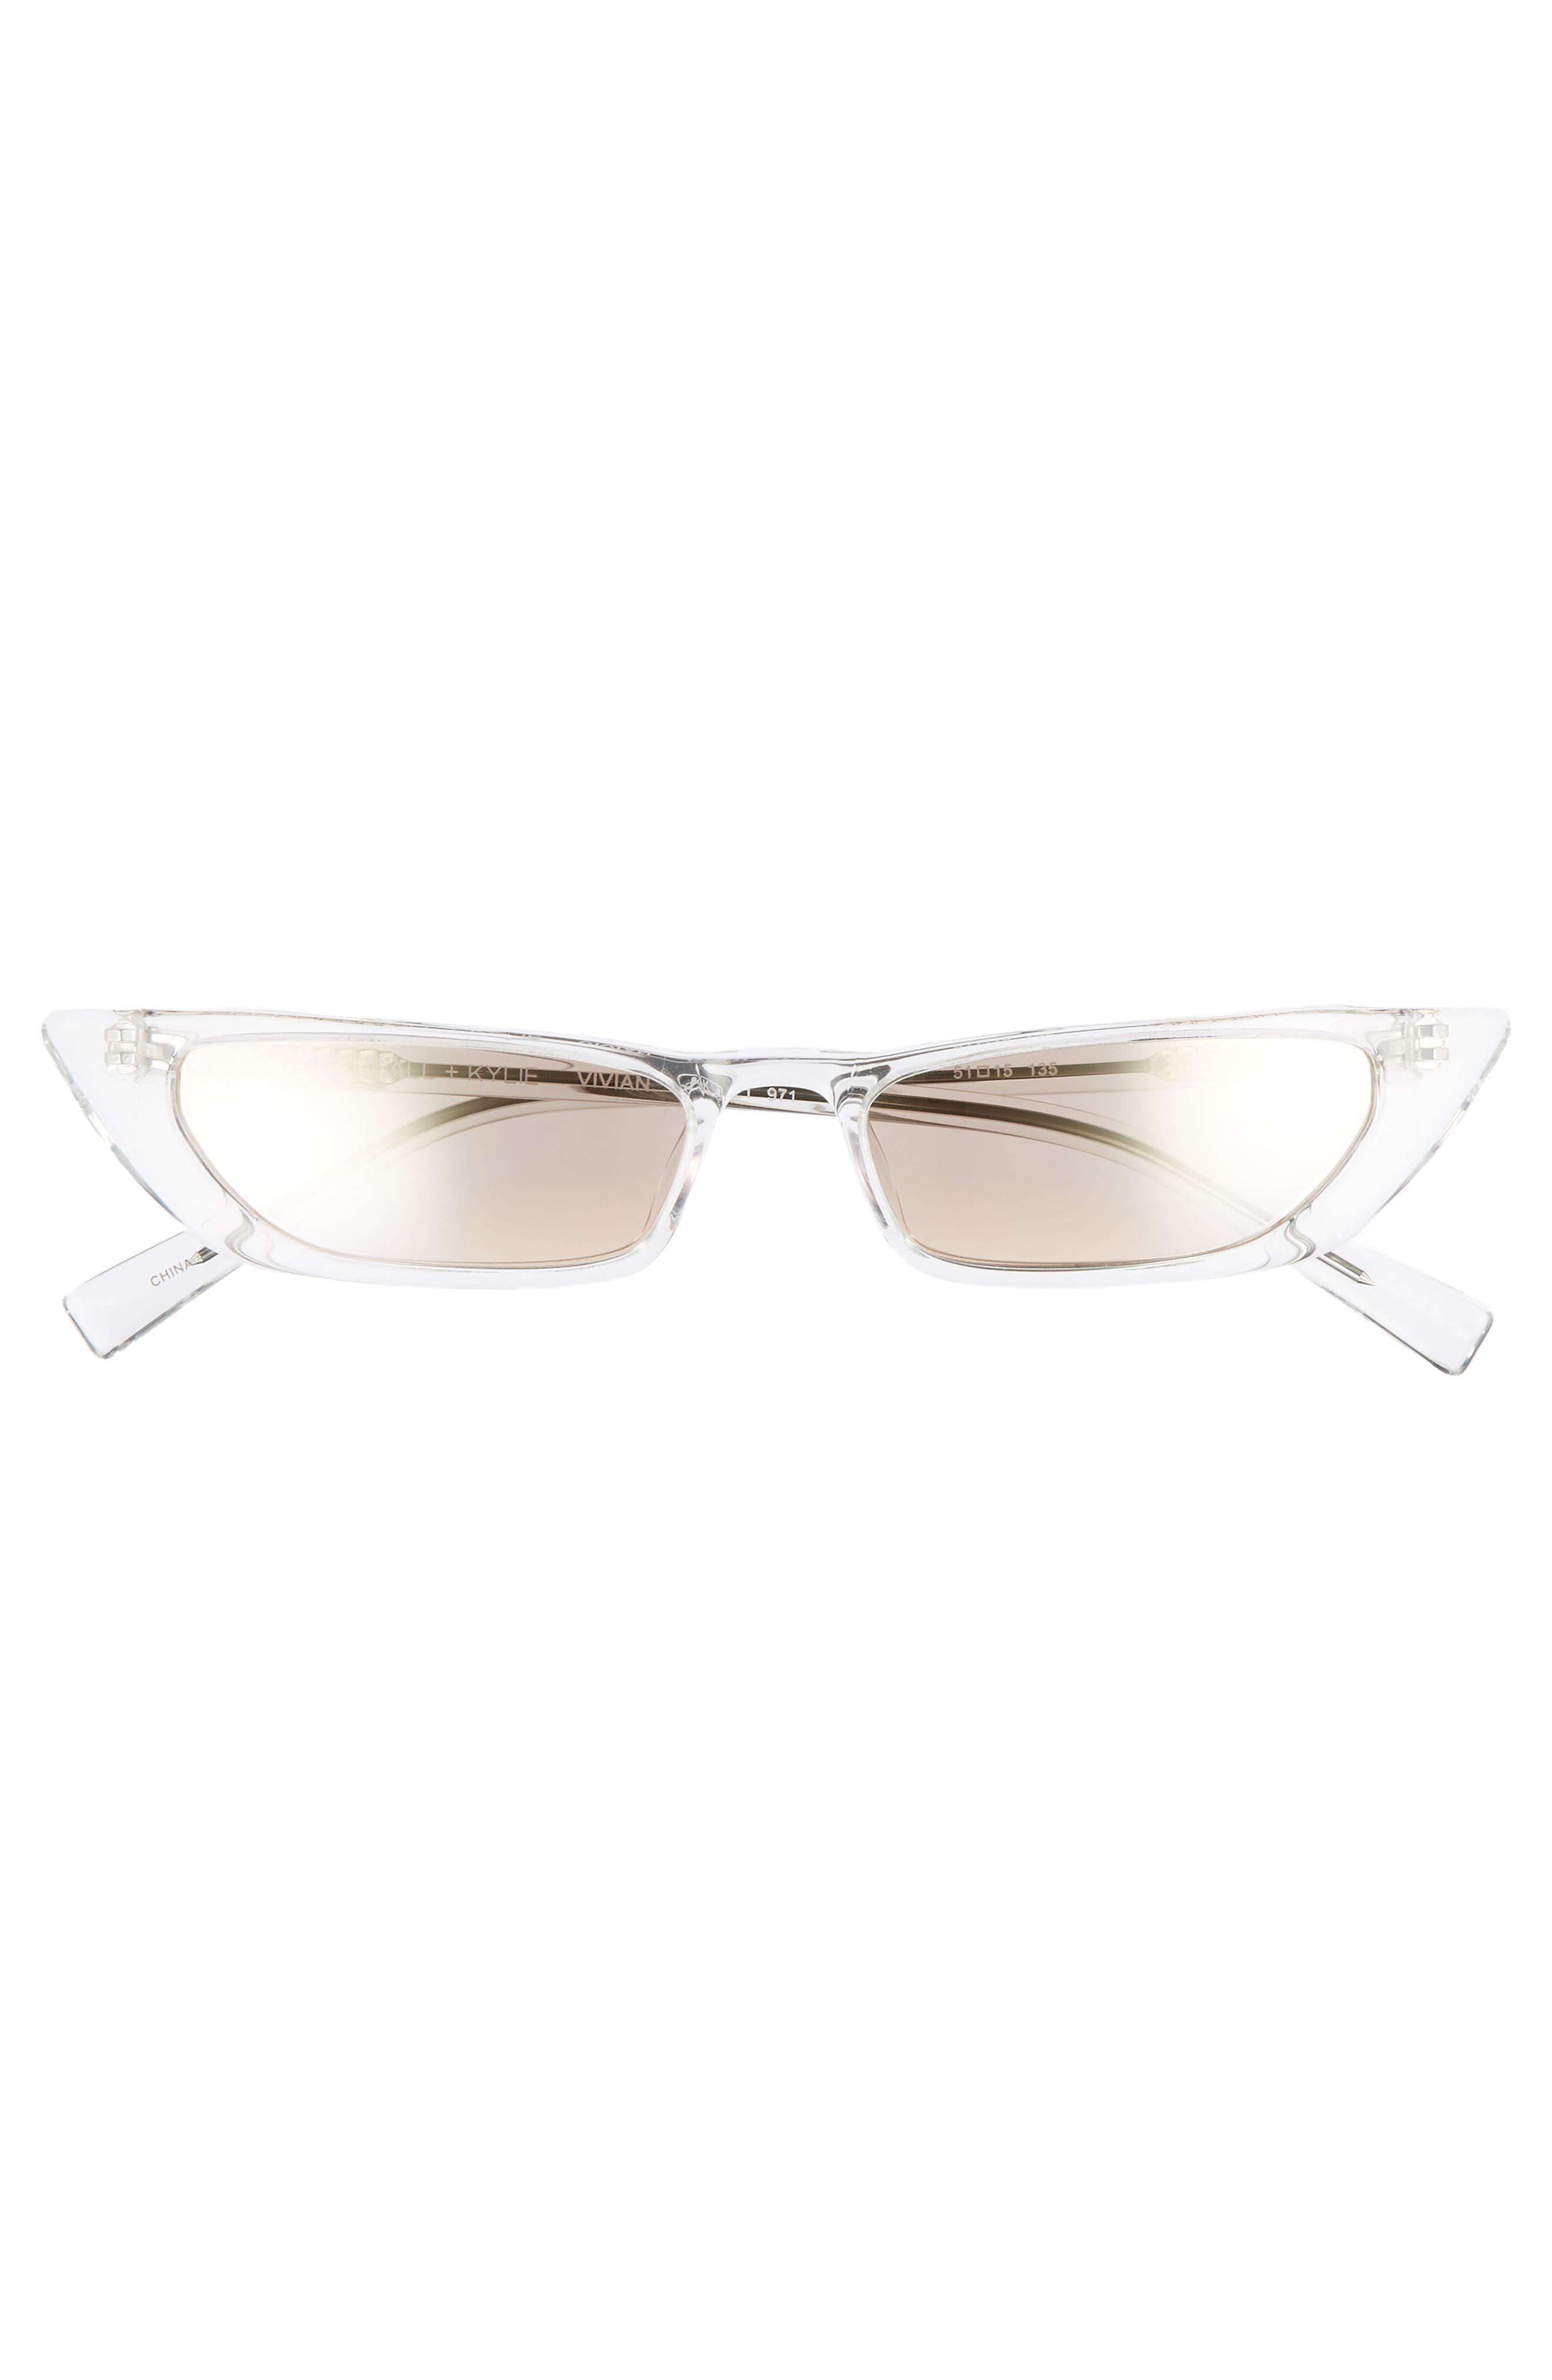 Vivian Extreme 51mm Cat Eye Sunglasses,                             Alternate thumbnail 3, color,                             Crystal/ Golden Hour Gradient